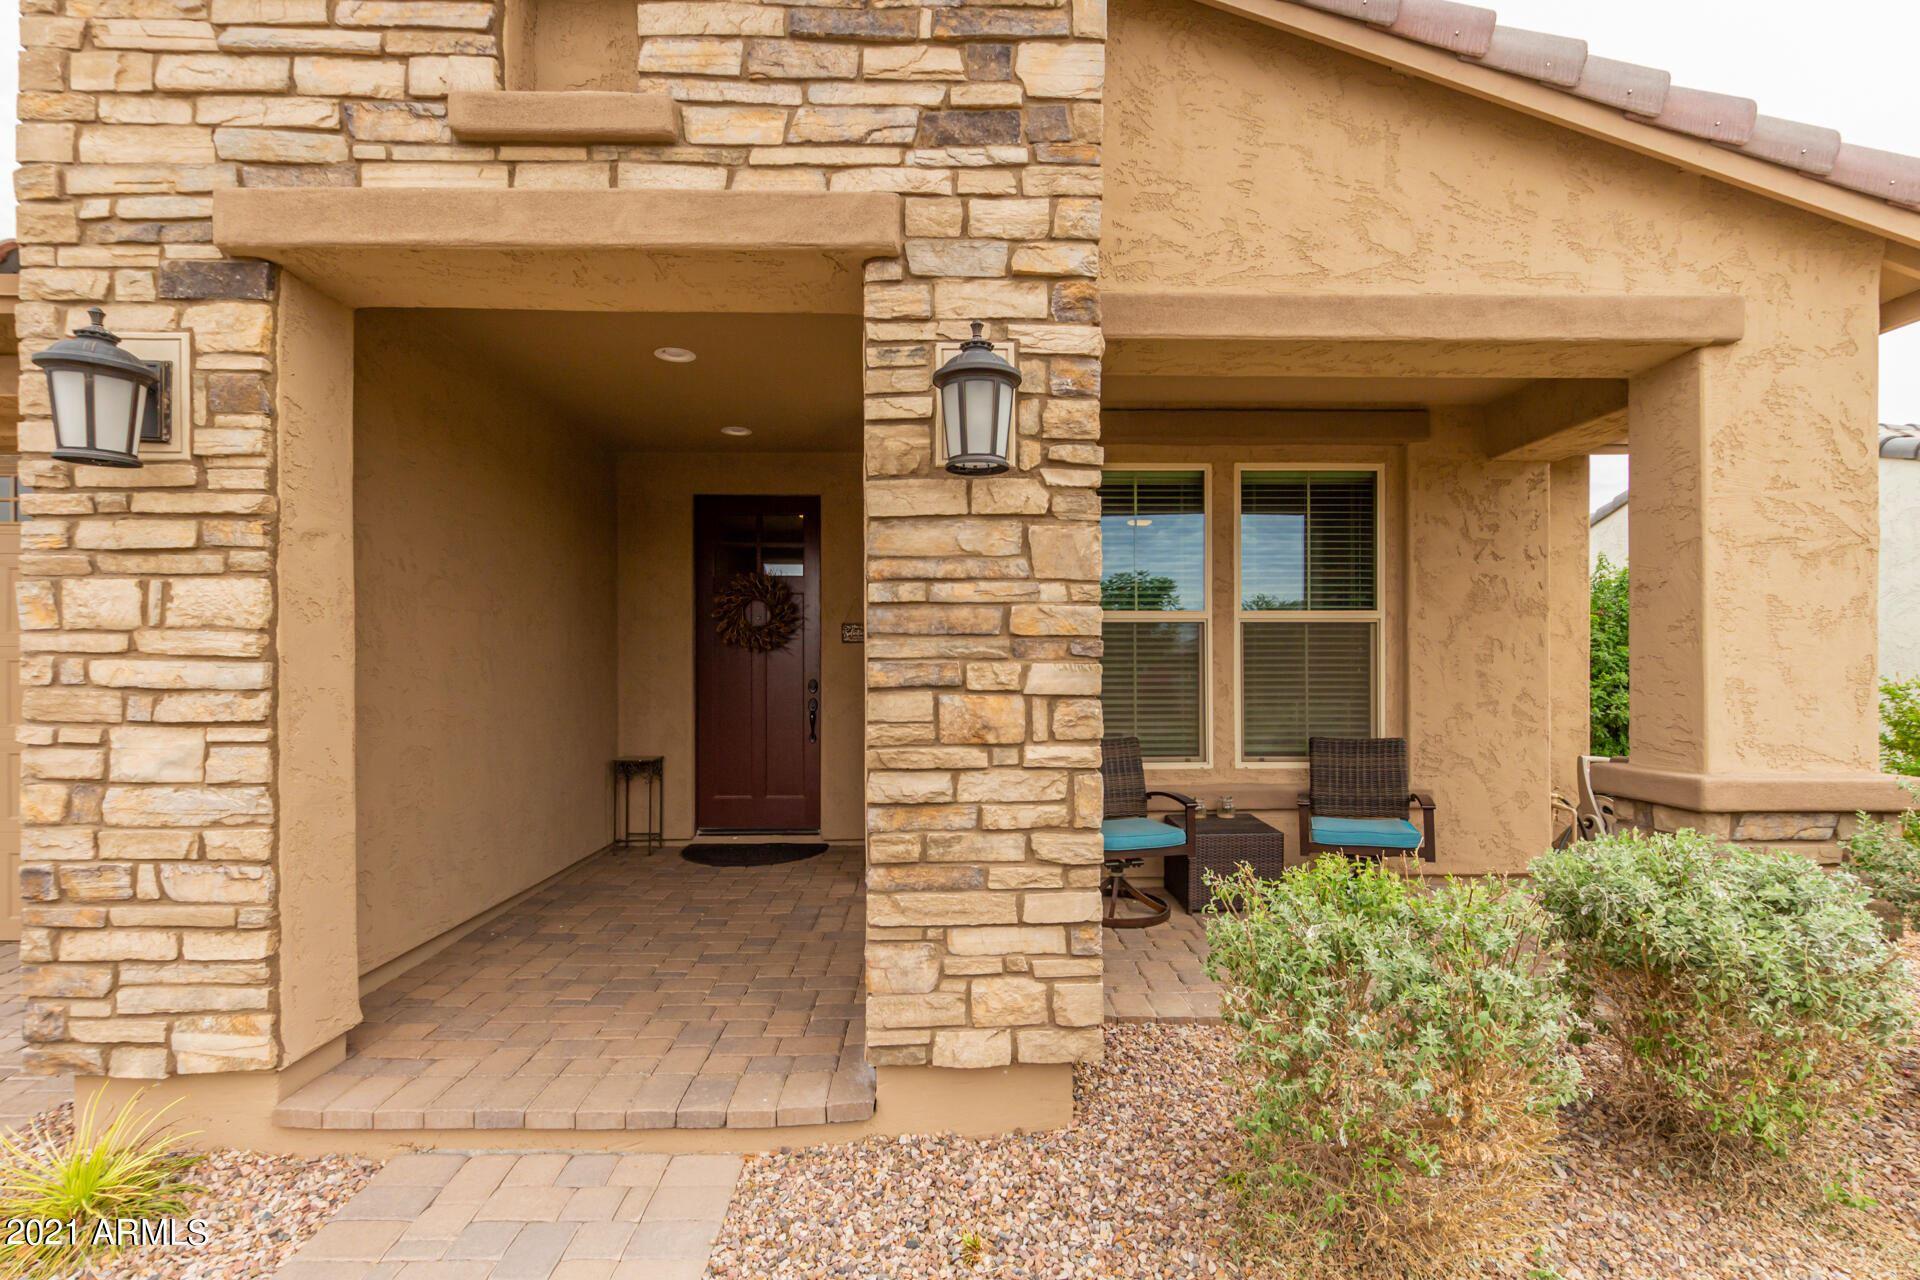 10425 E SEBRING Avenue, Mesa, AZ 85212 - MLS#: 6238831